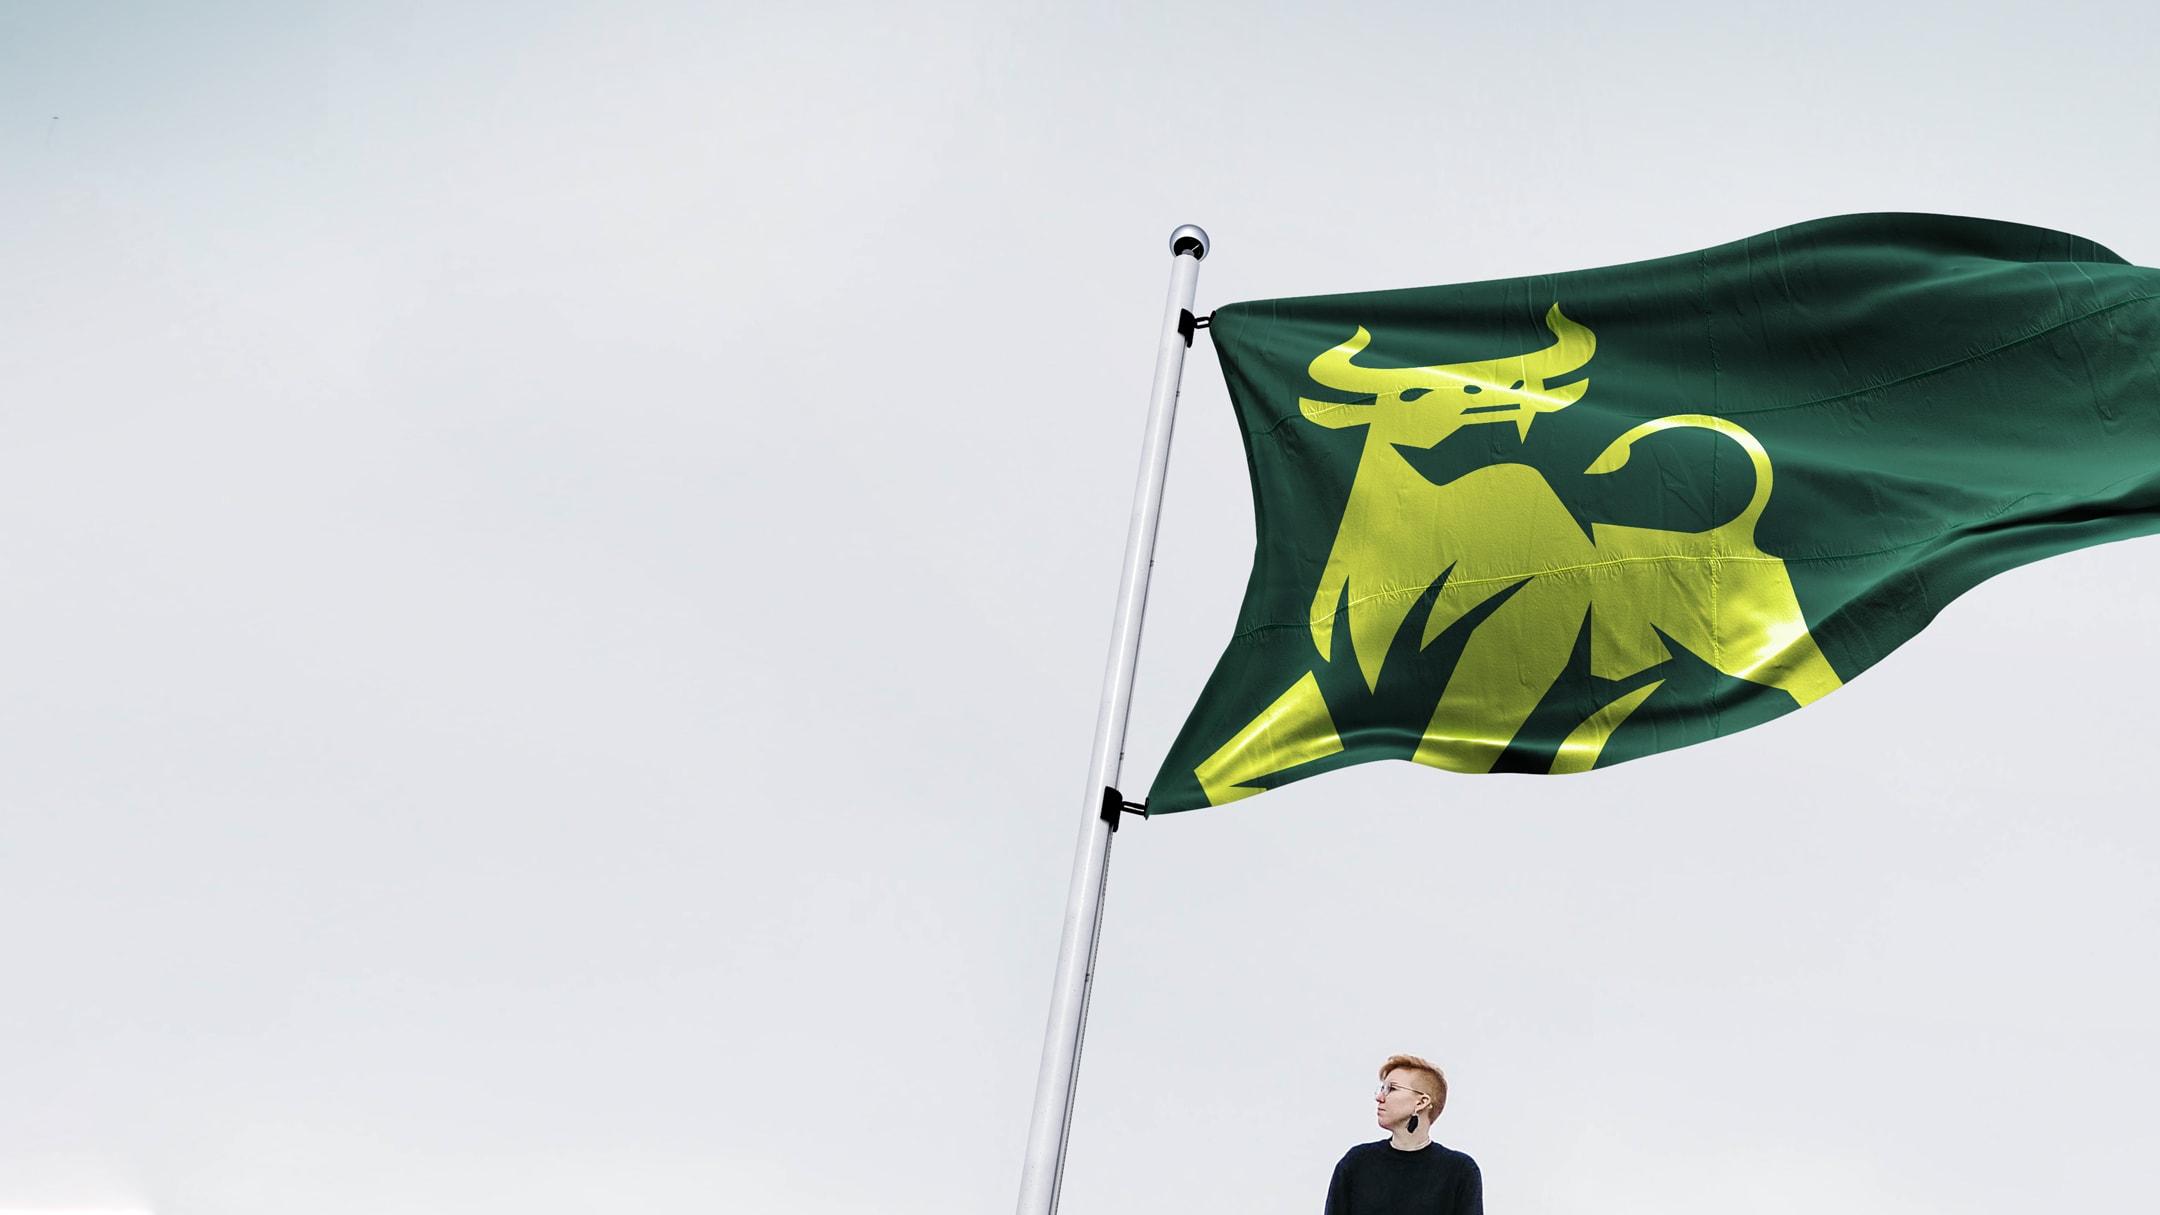 USF rebrand sample - waving campus flag